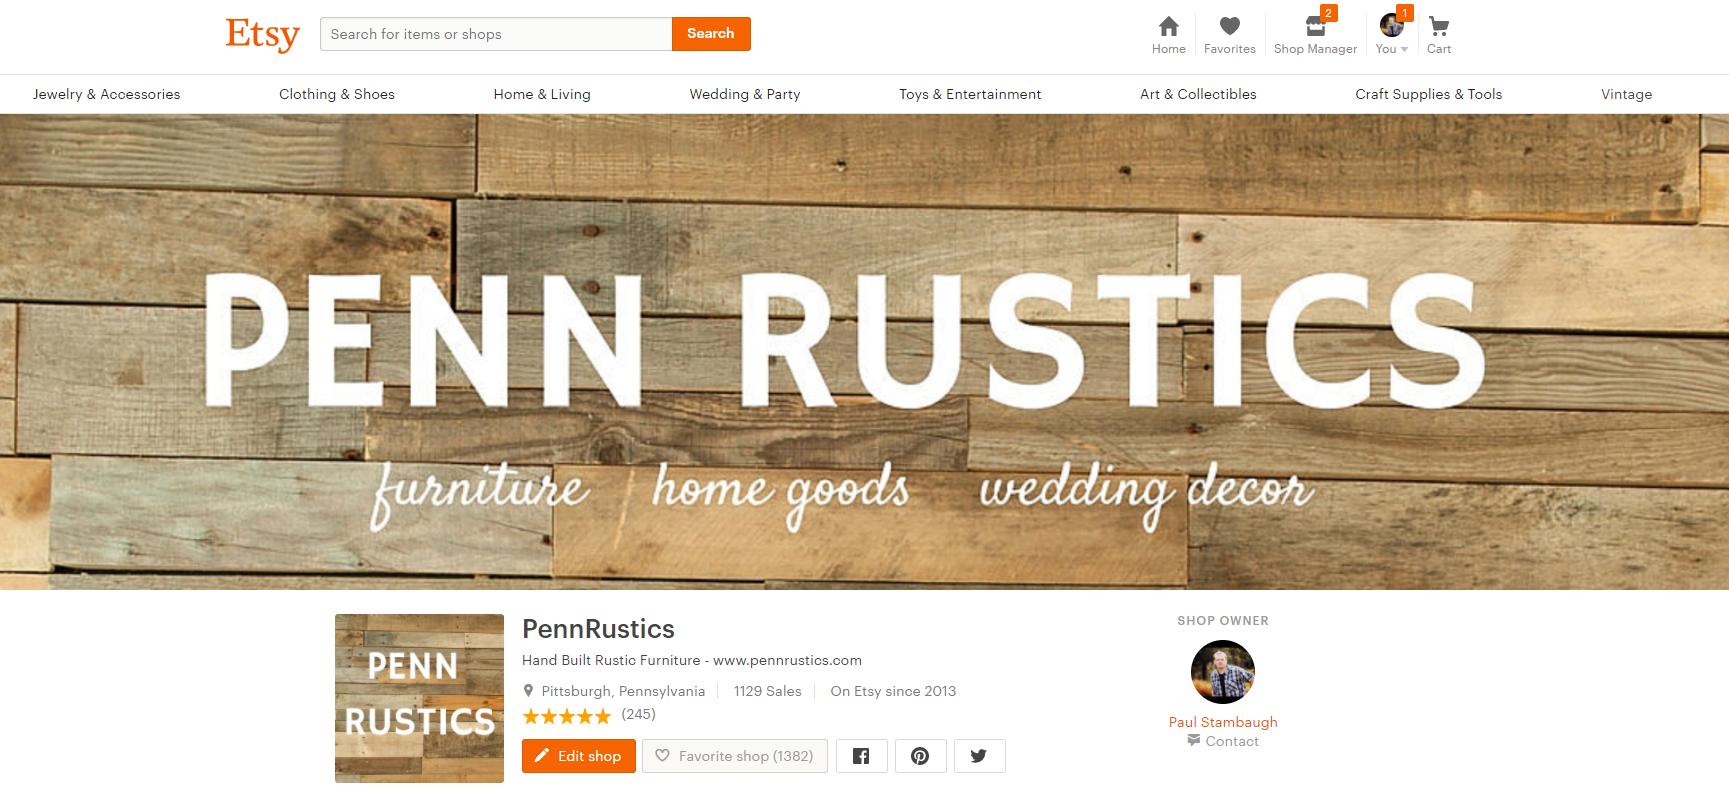 Etsy_Penn Rustics.png